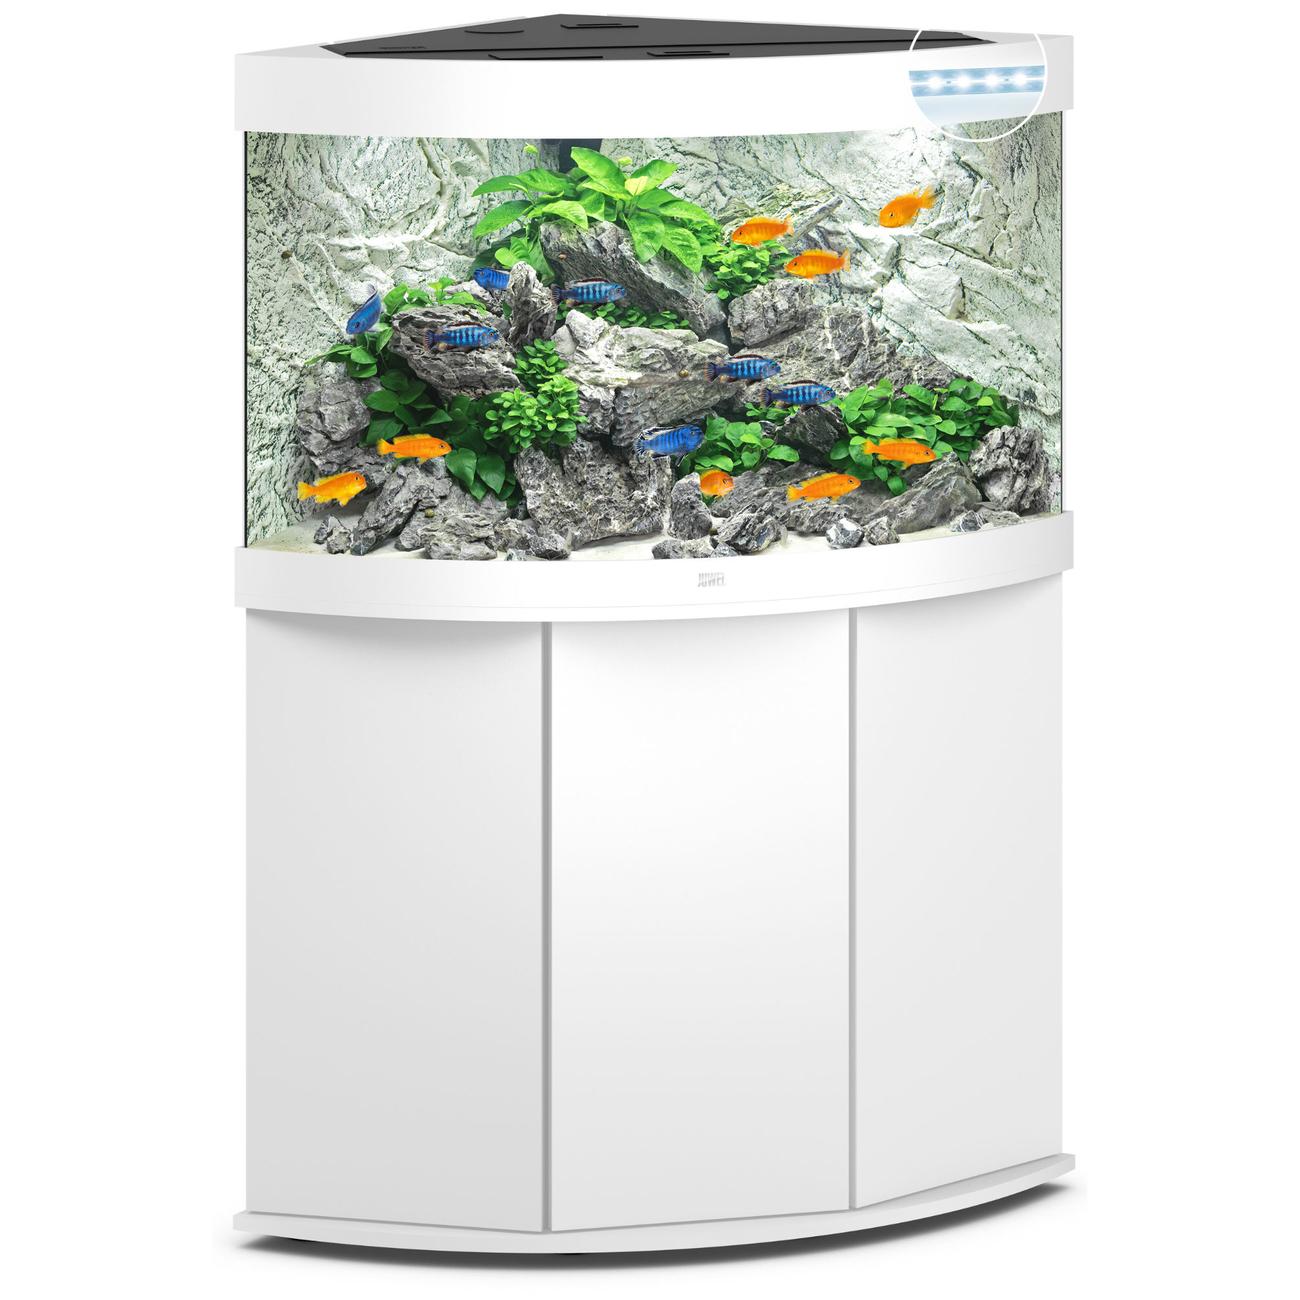 Juwel Trigon 190 LED Eck-Aquarium mit Unterschrank, Bild 7